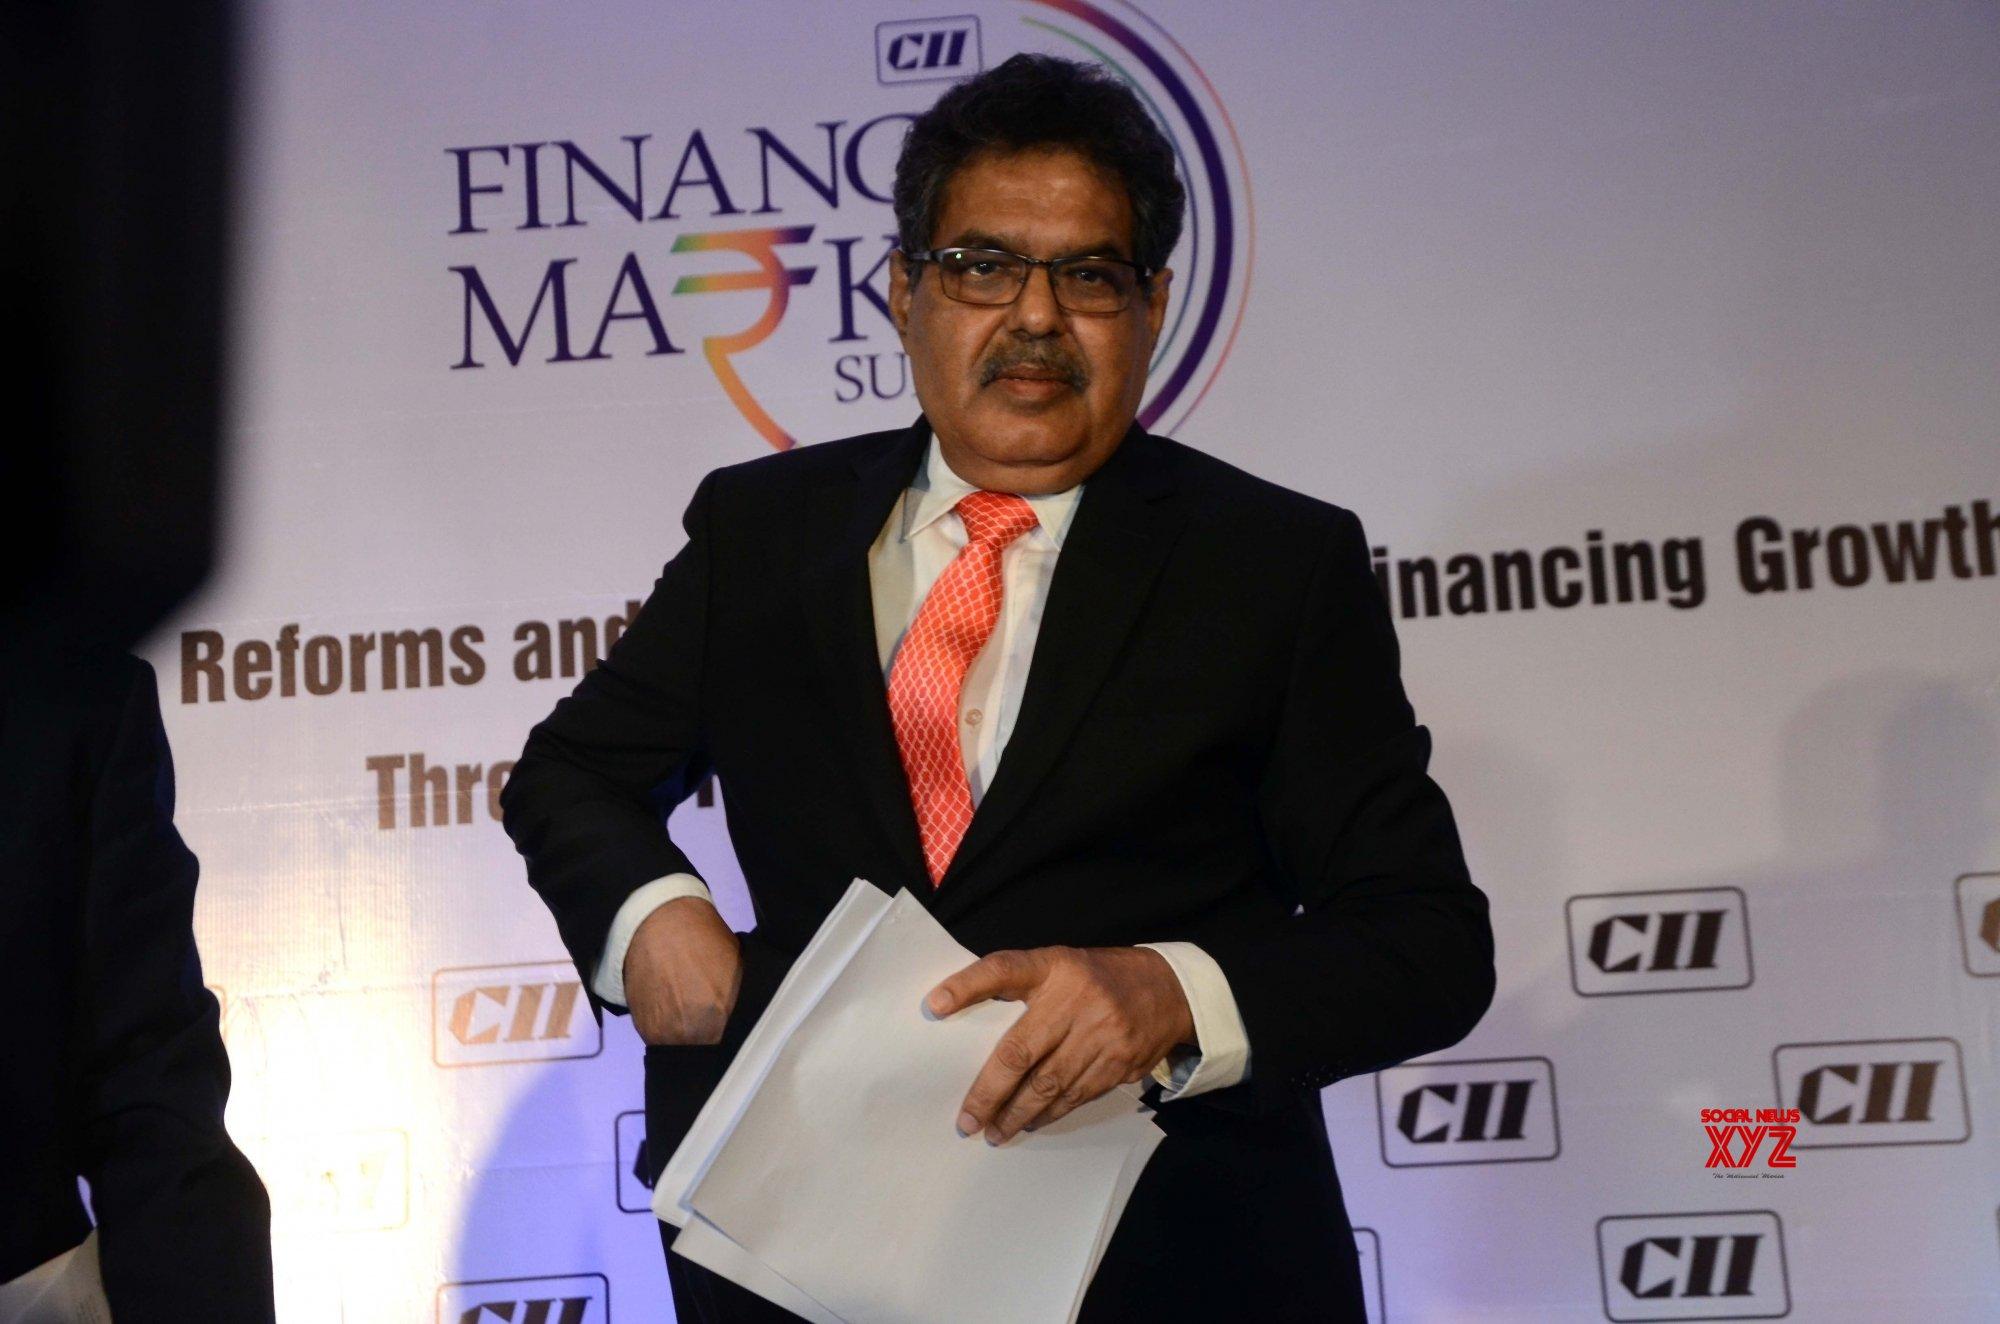 SEBI Chief calls for investor awareness as retail participation grows